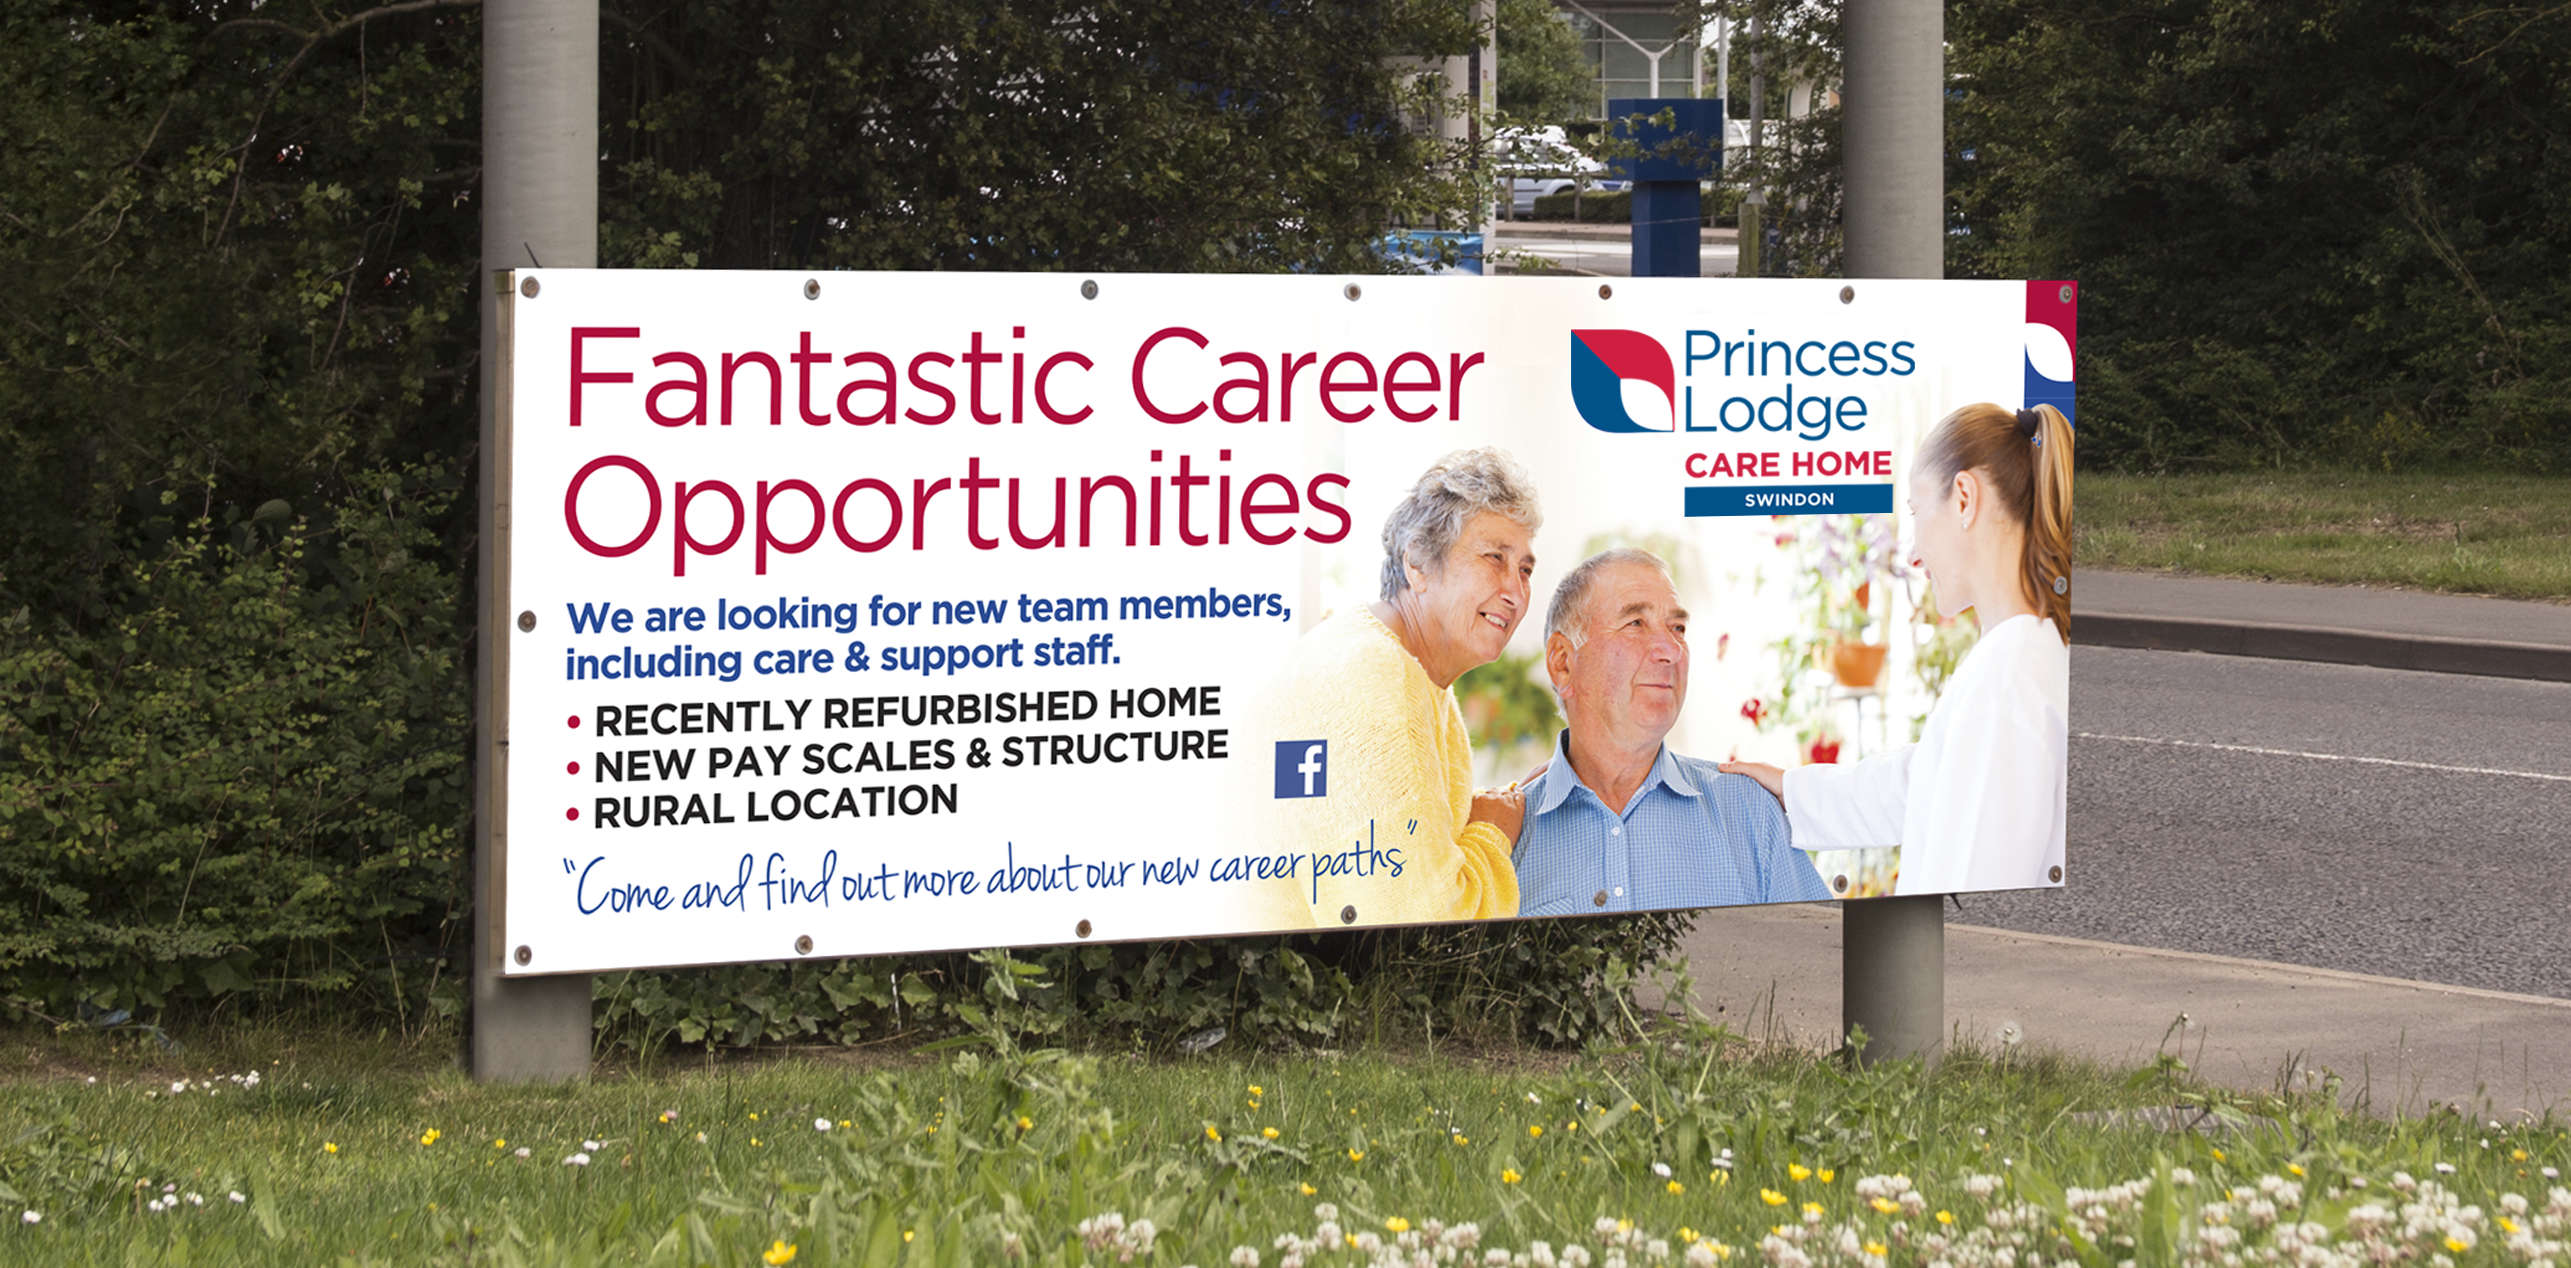 Lifestyle Care signage billboard